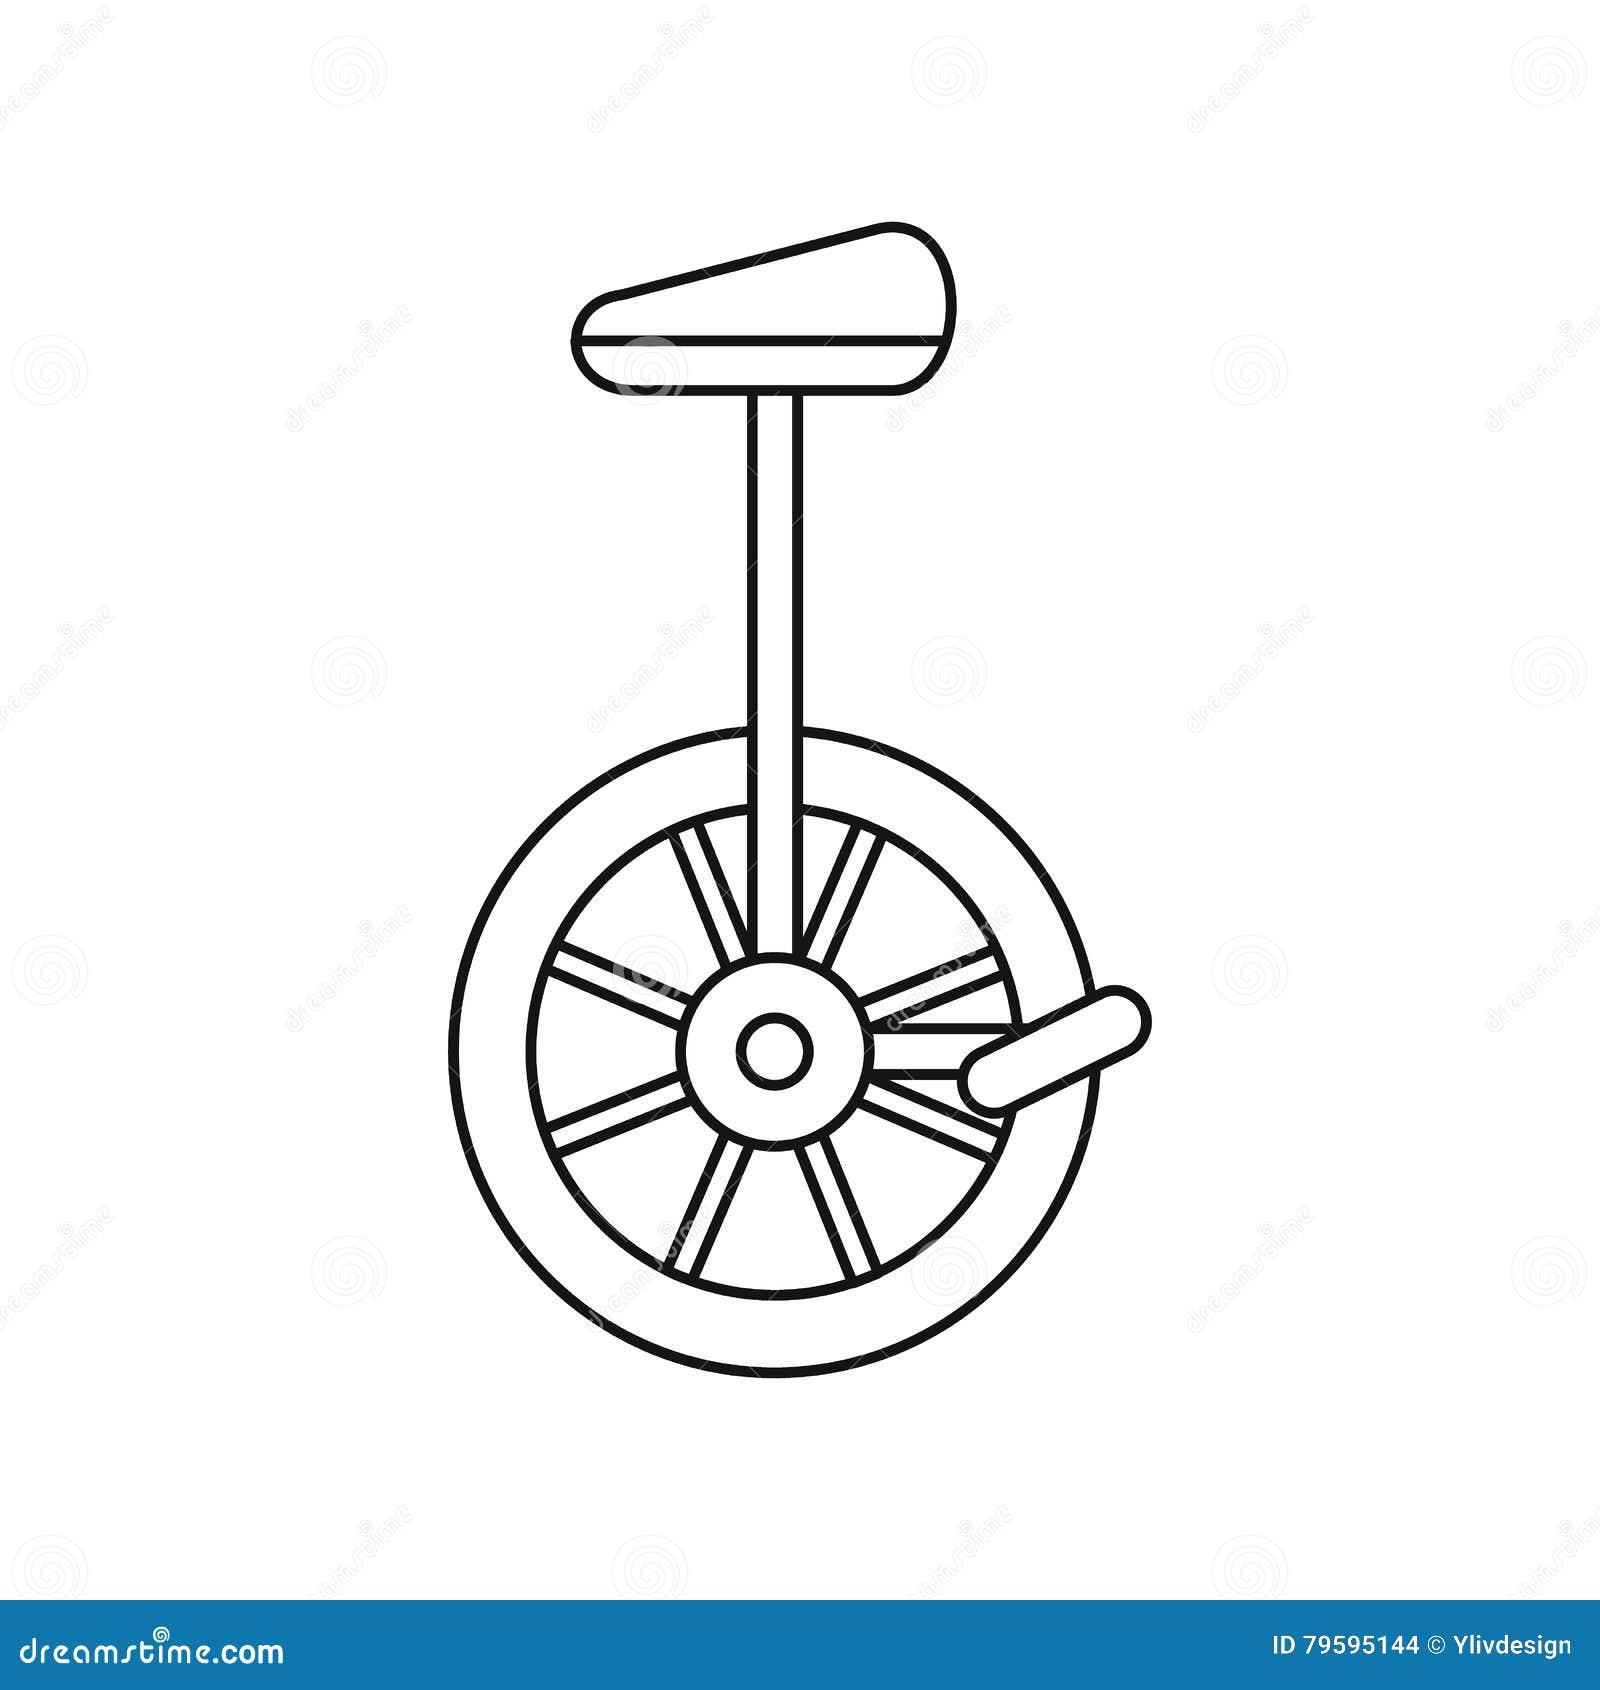 Line Art Unicycle : Unicycle one wheel bicycle icon outline style stock